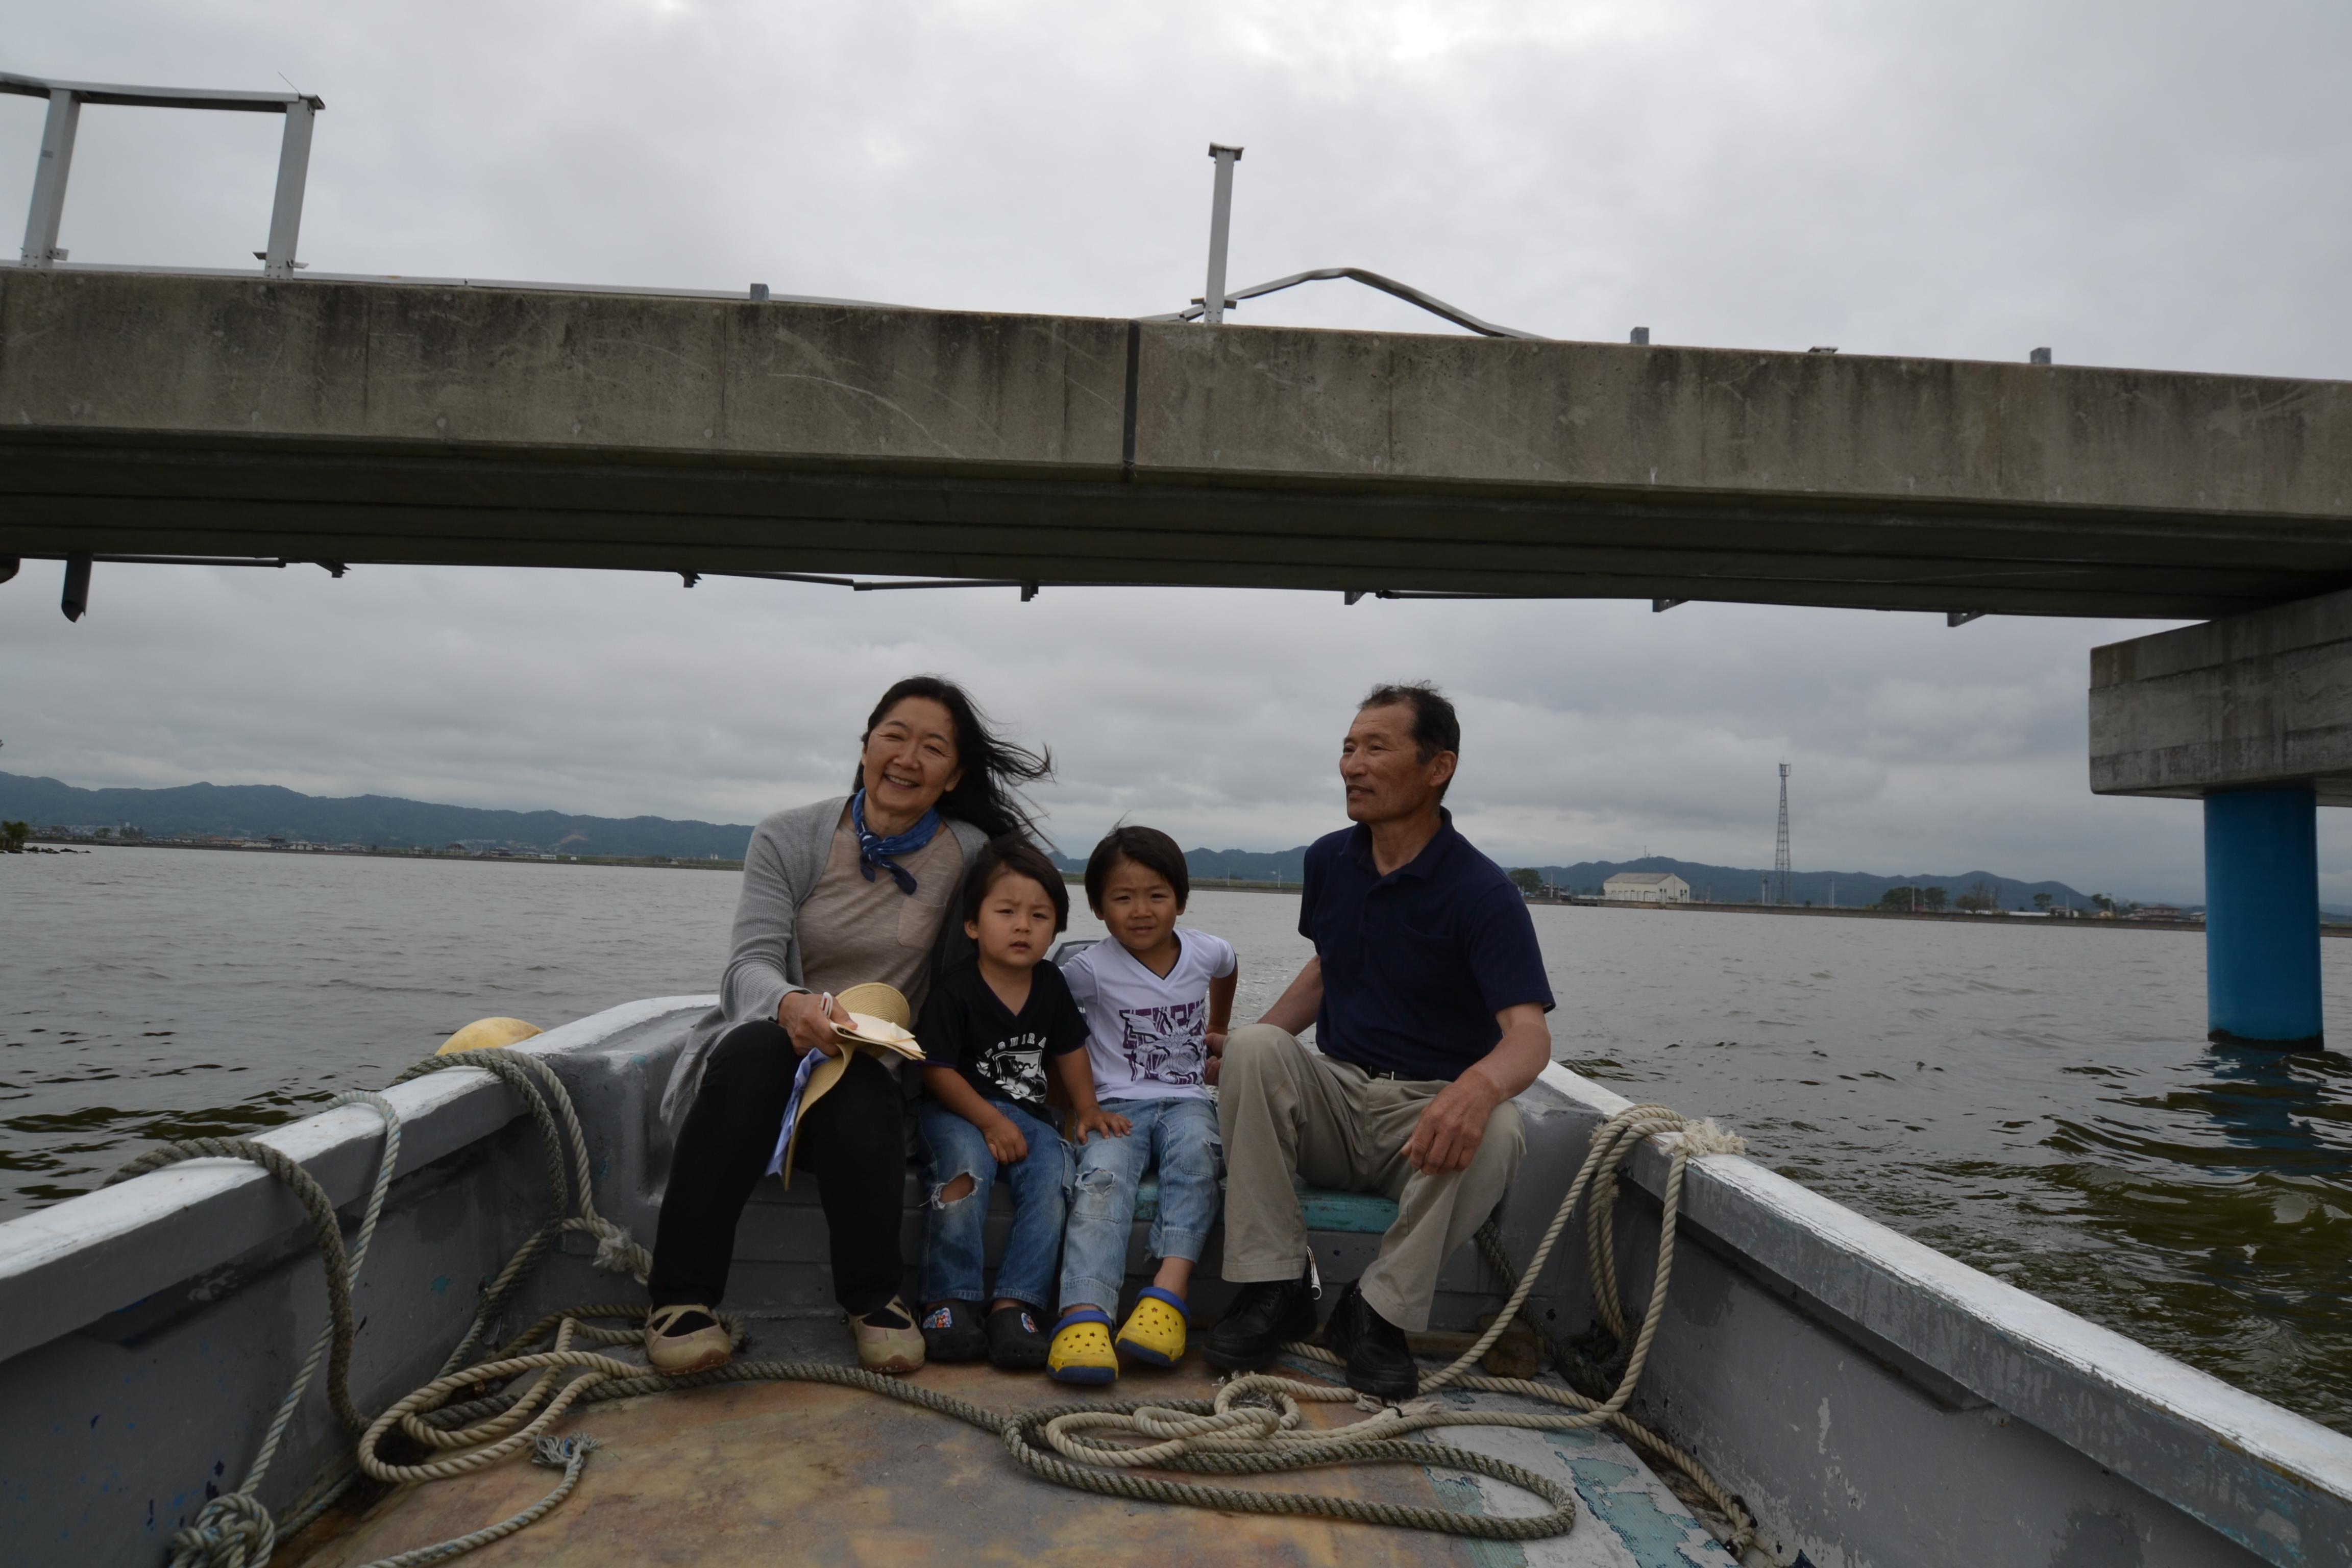 watari fisherman, linda, kuma kids check river.JPG